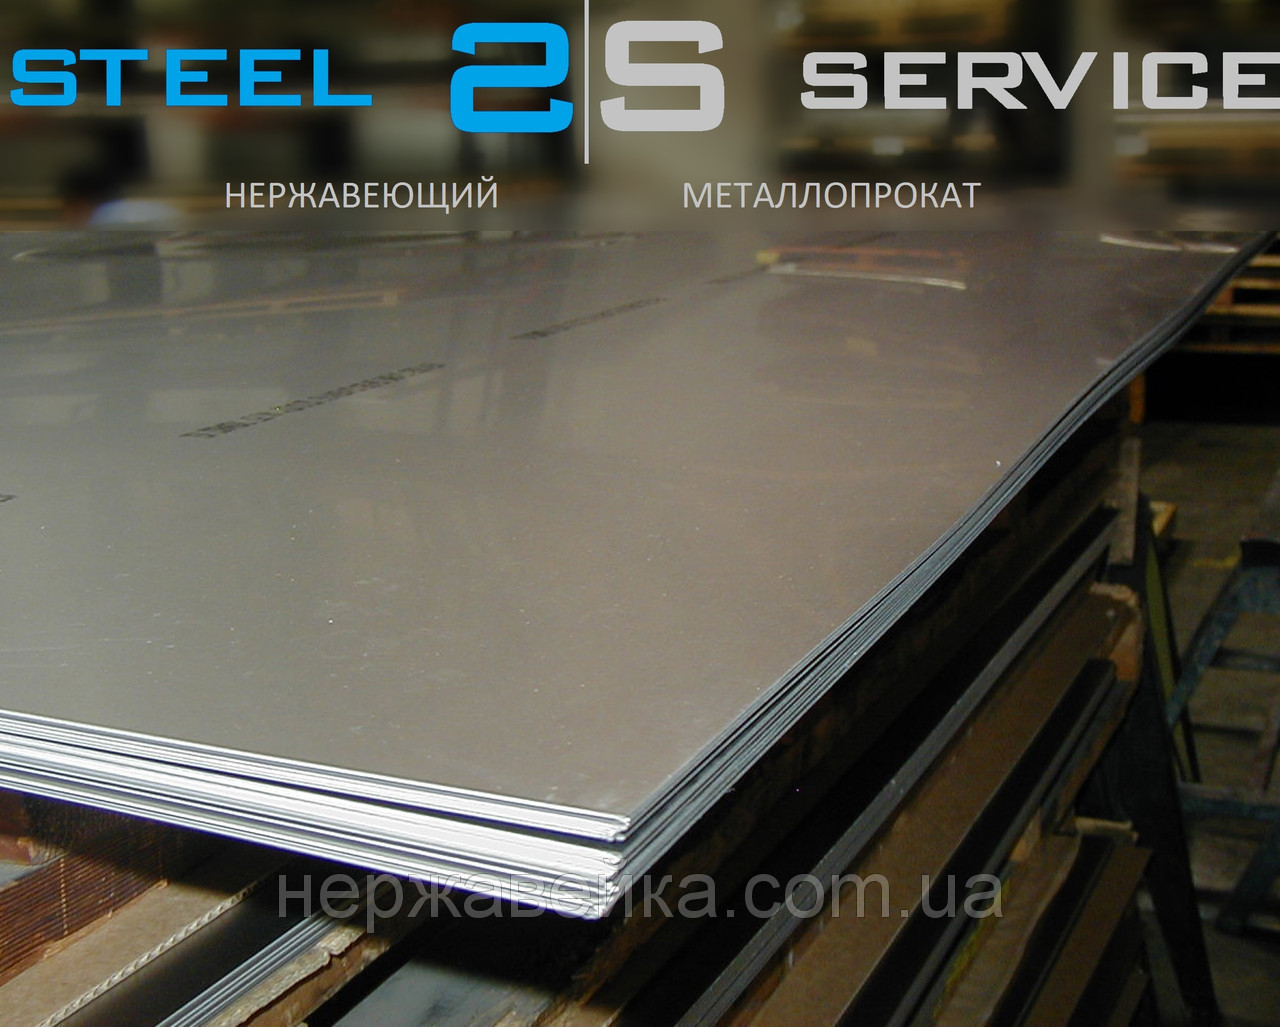 Нержавеющий лист 12х1500х3000мм AISI 430(12Х17) 2B - матовый, технический